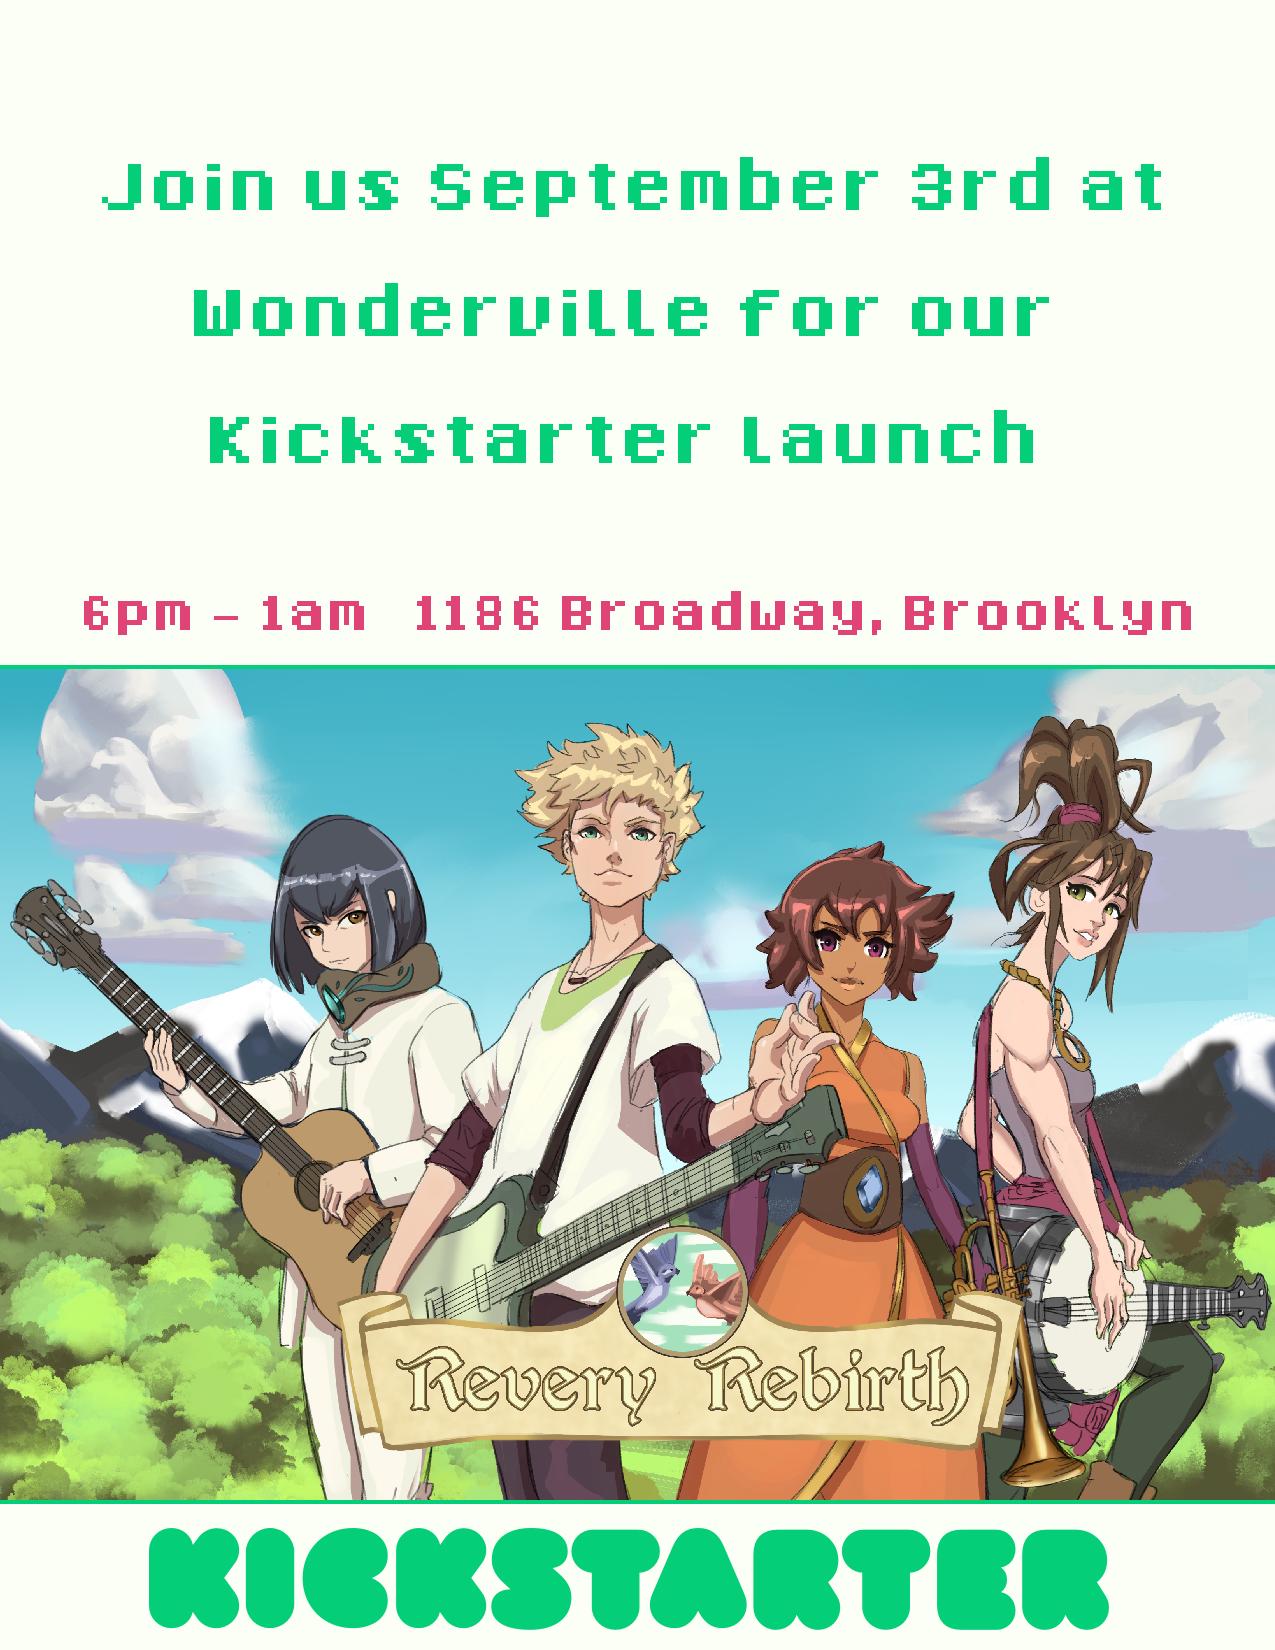 RSVP:  https://withfriends.co/Event/2492315/Revery_Rebirth_Kickstarter_Launch